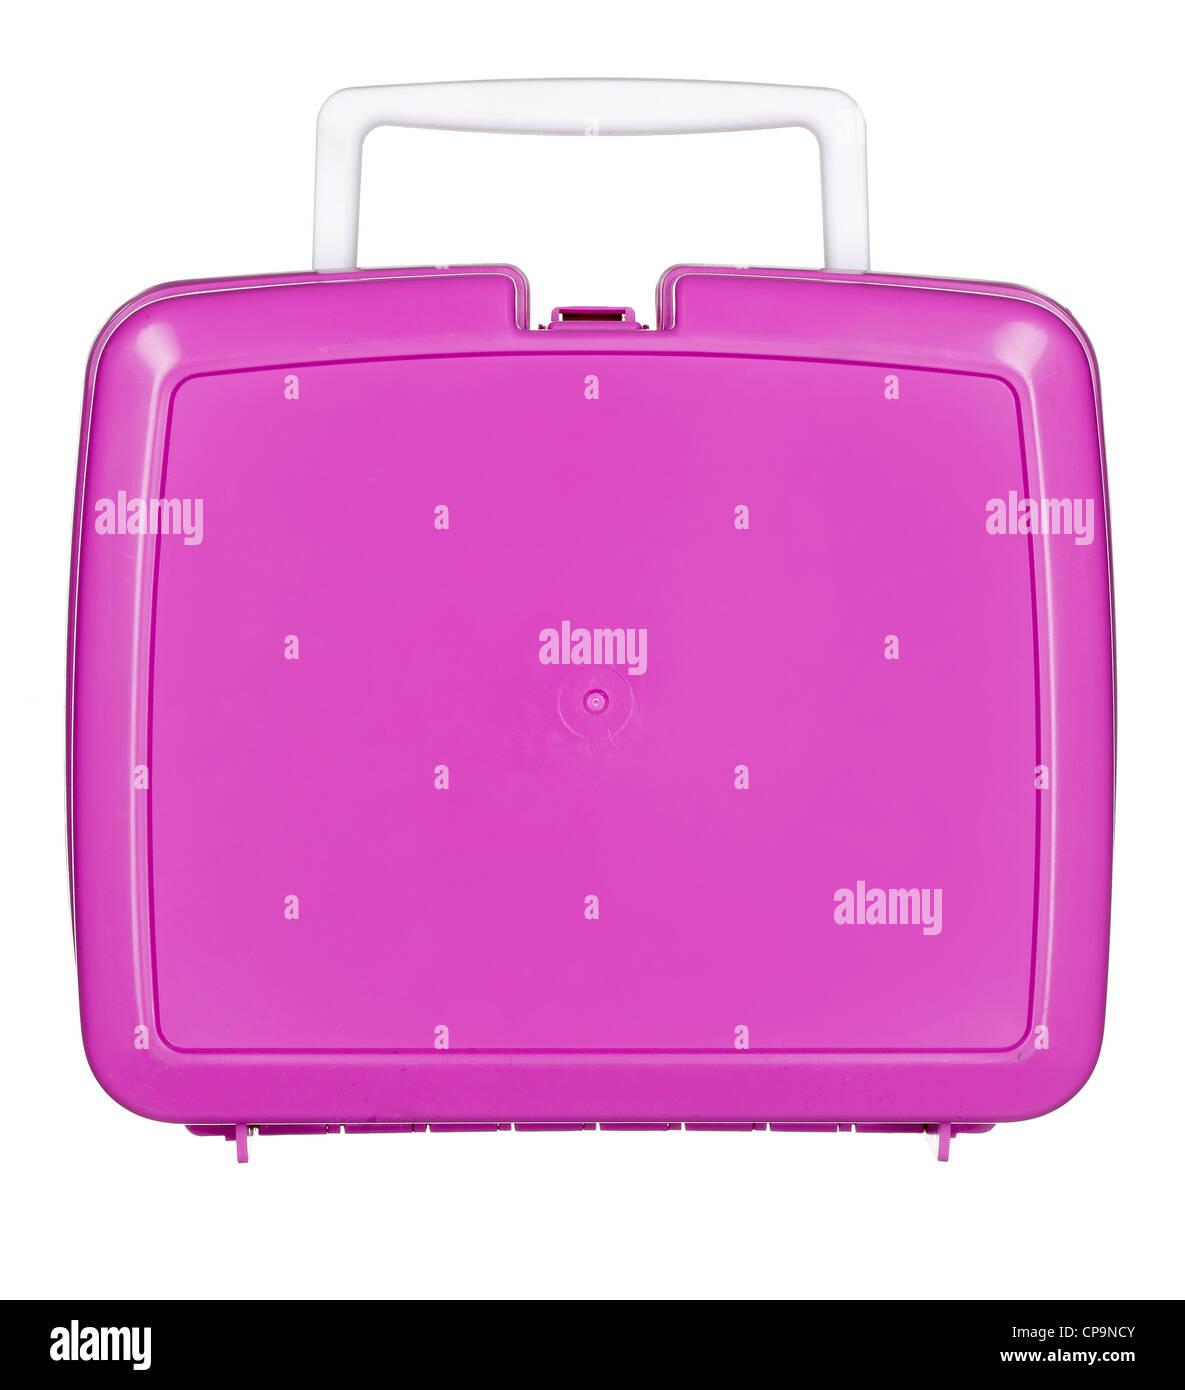 pink girls lunch box Stock Photo: 48157563 - Alamy